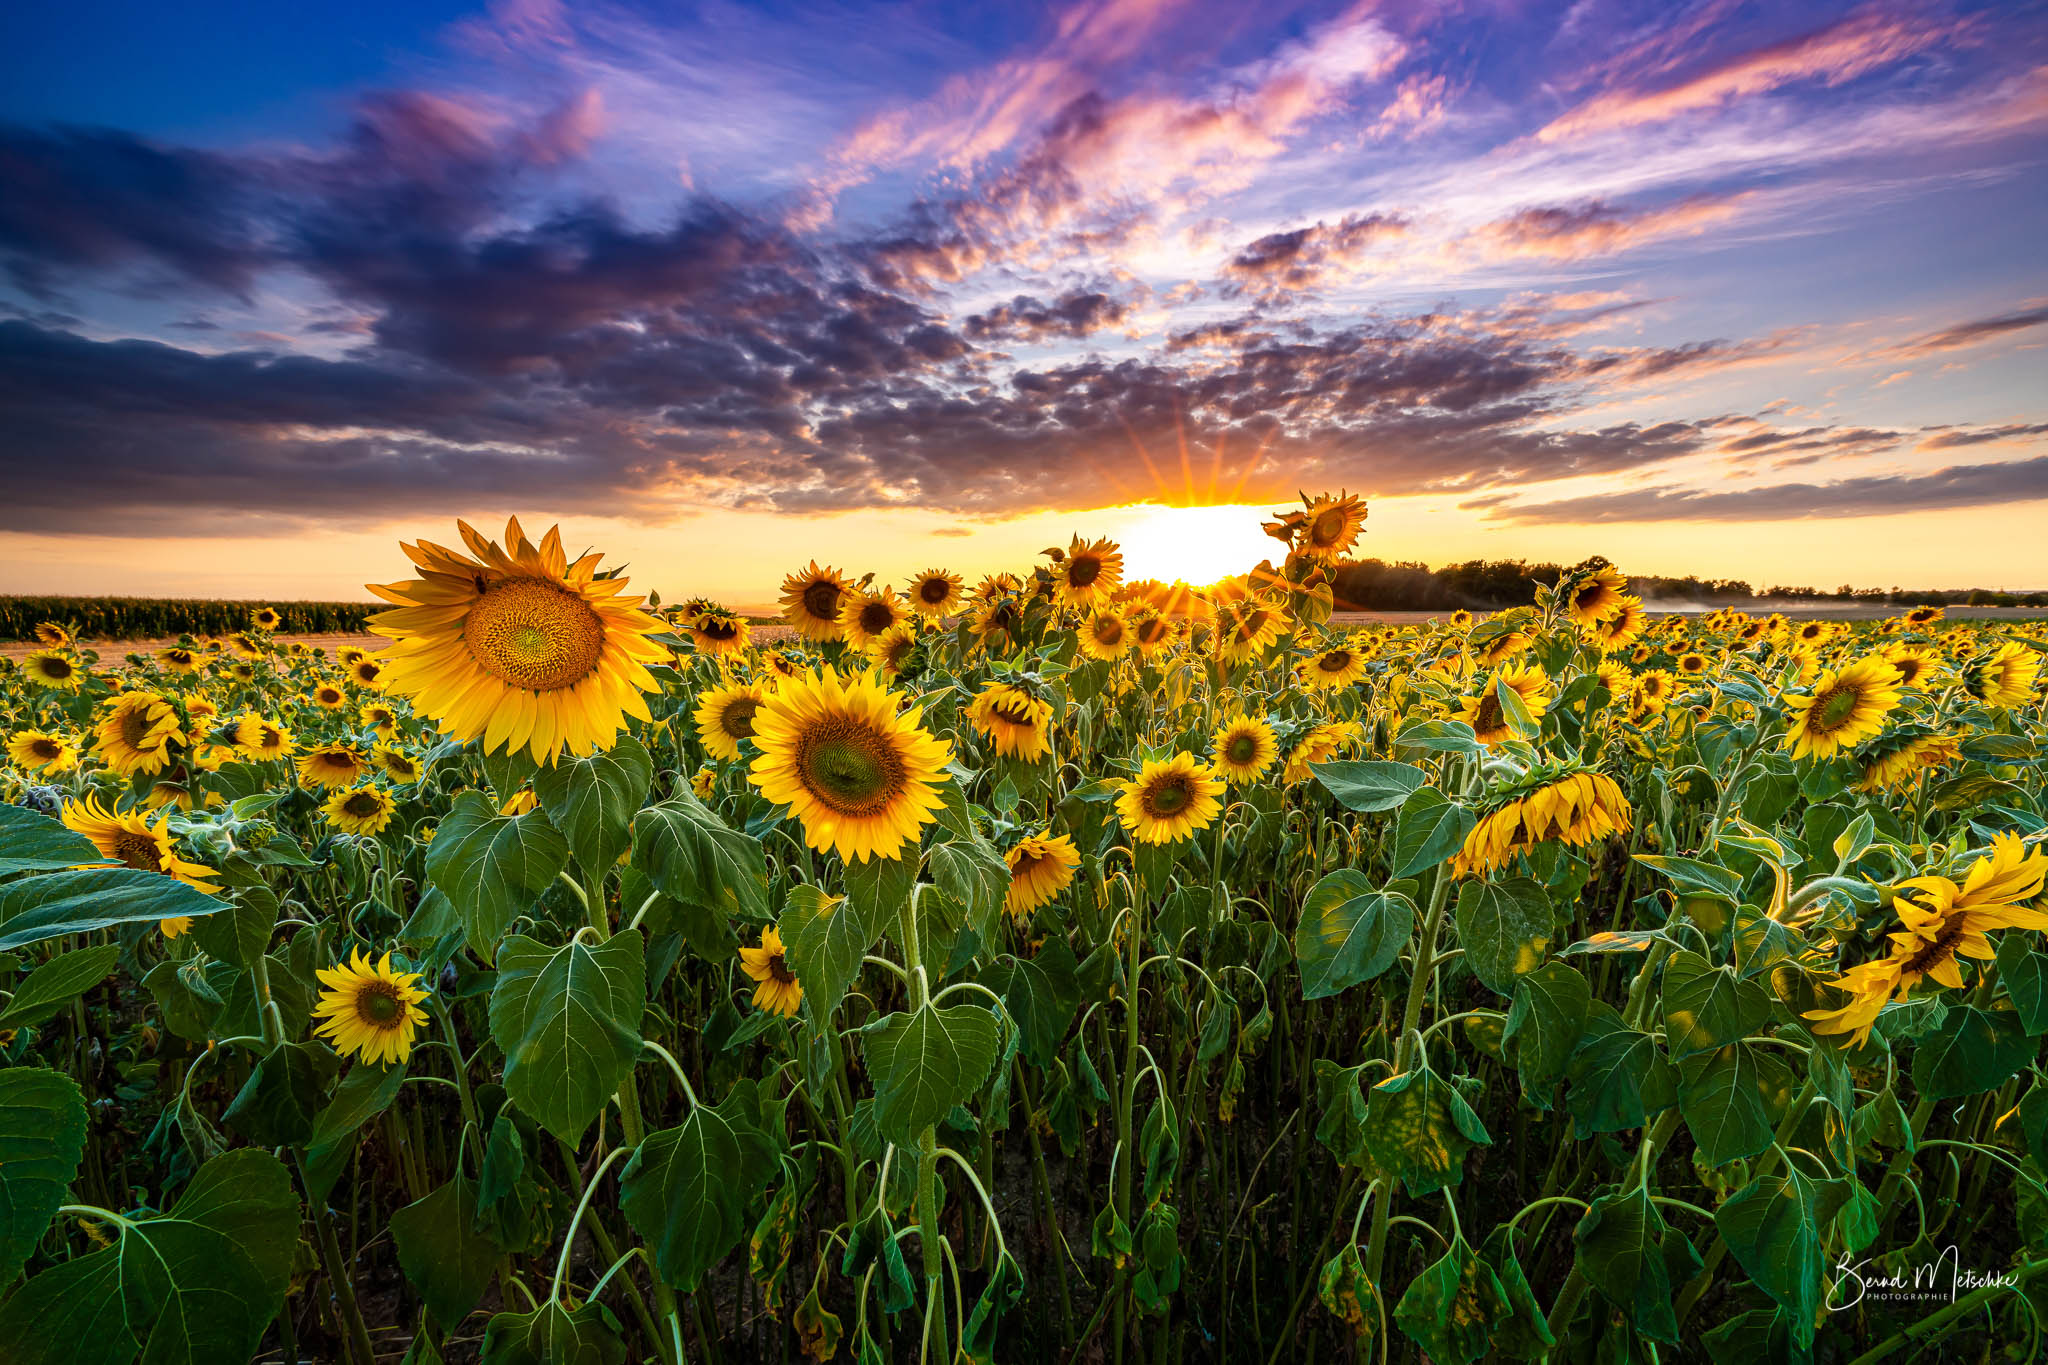 Sonnenblumen bei Sonnenuntergang